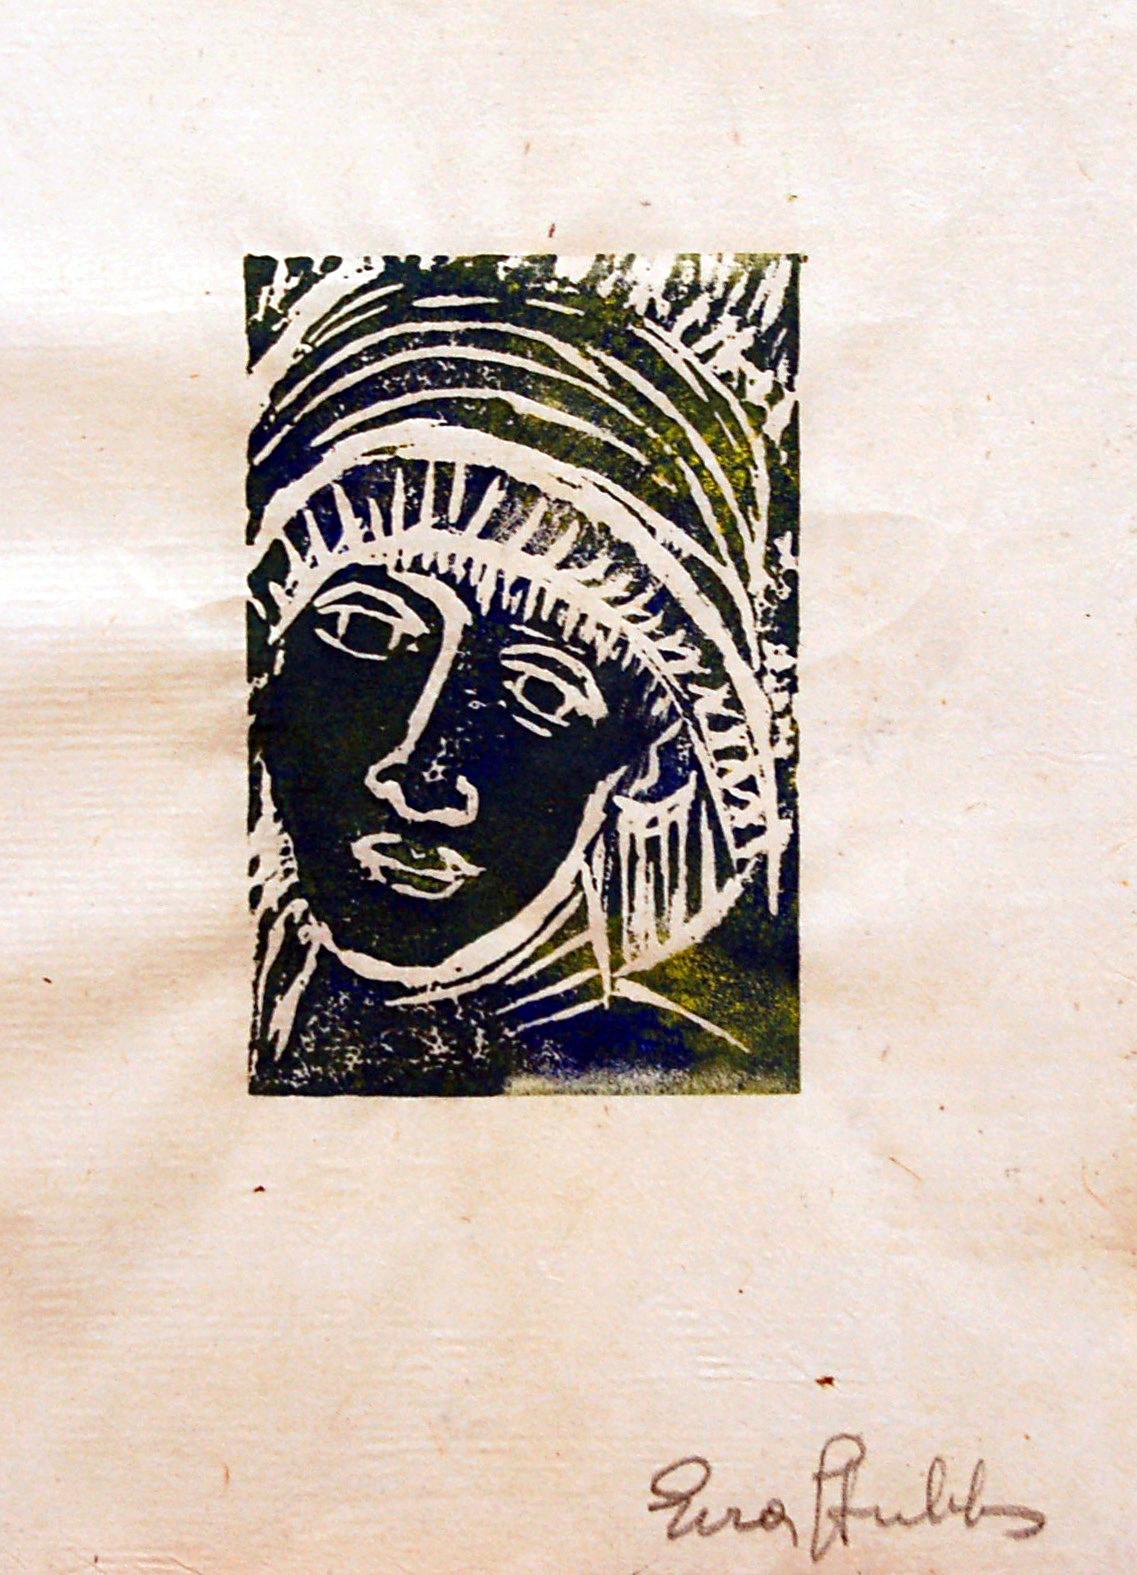 "Face-coloured, ca1980, Print on Parchment, 4"" x 6.5"""